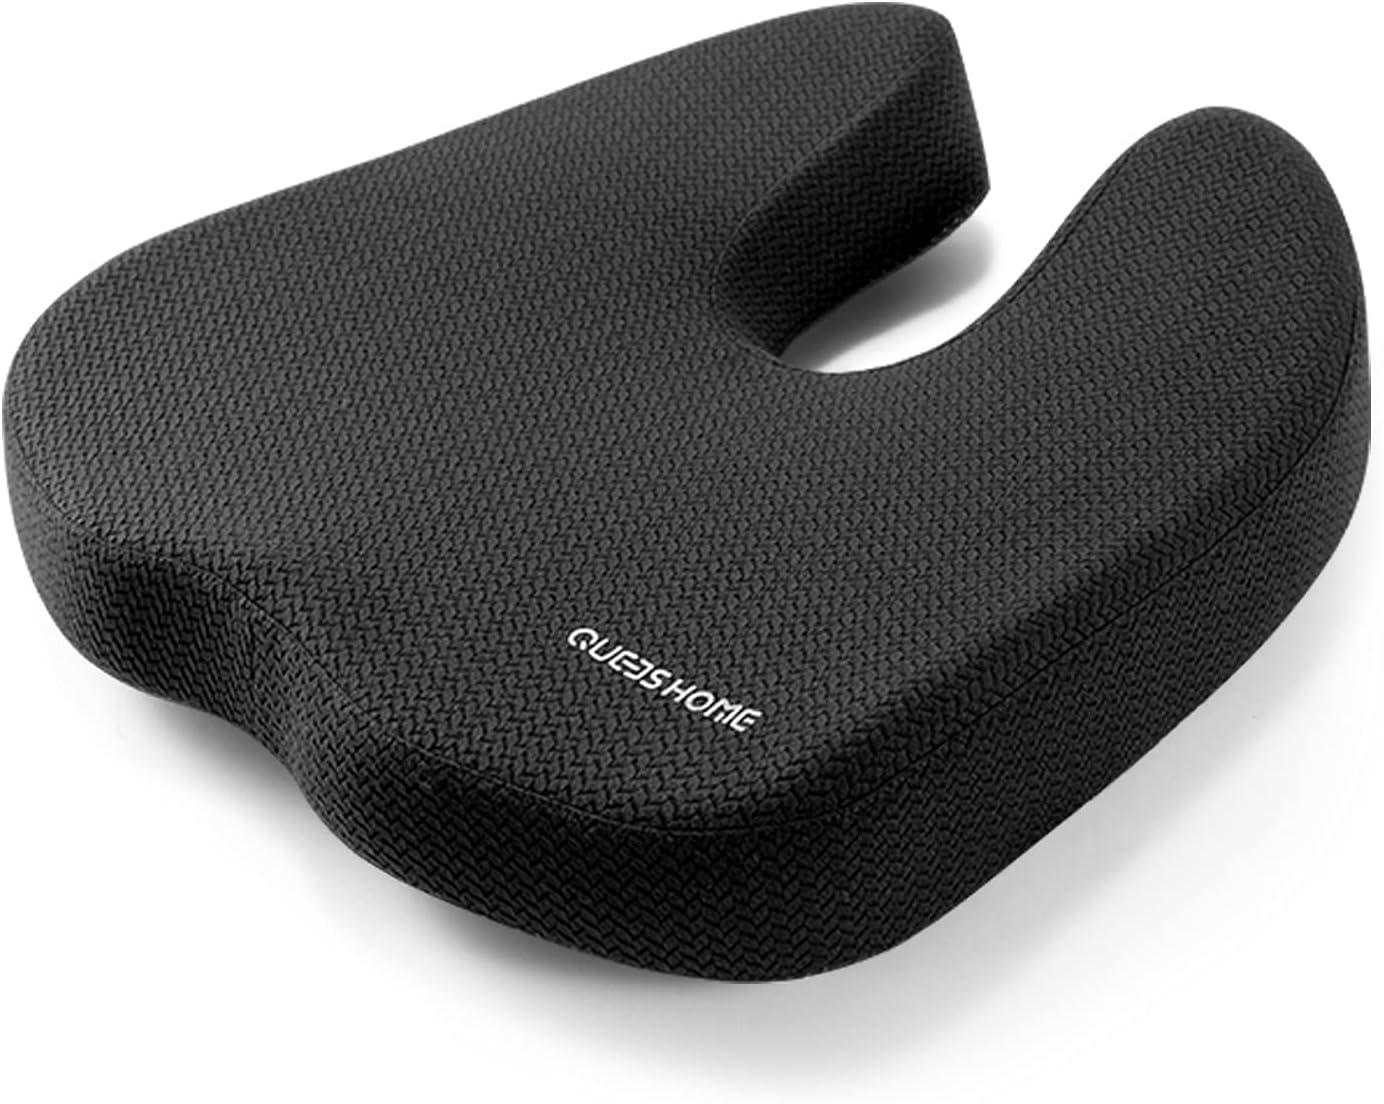 QUEES Seat Cushion for Office Chair, Memory Foam Chair Cushion Coccyx Cushion for Tailbone & Back Pain Relief